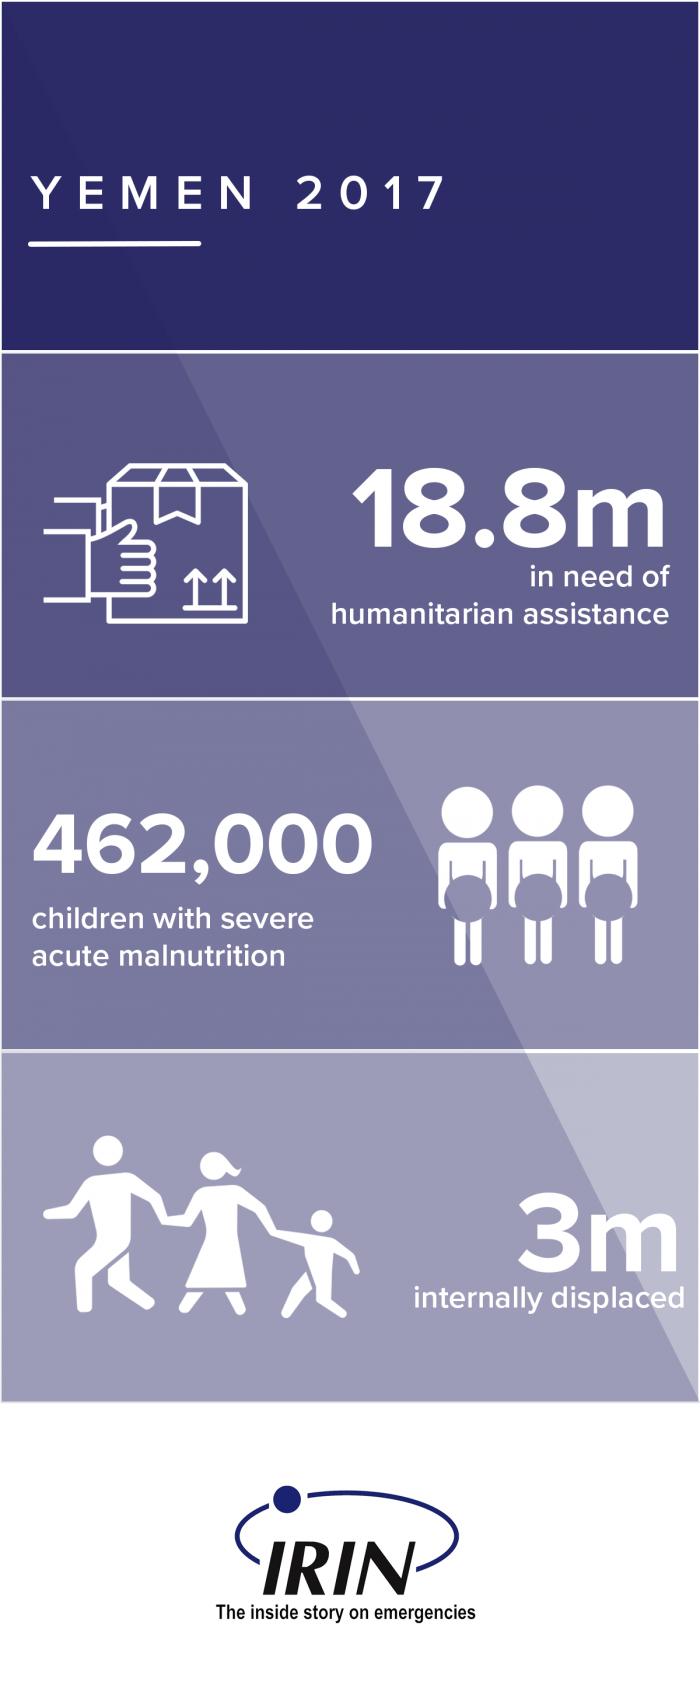 http://assets.irinnews.org/s3fs-public/styles/responsive_medium/public/yemen_starvation_crisis.png?D9f95641ip_f.npwMbvQQcAd1aG8Cew4&itok=gRonLkdE